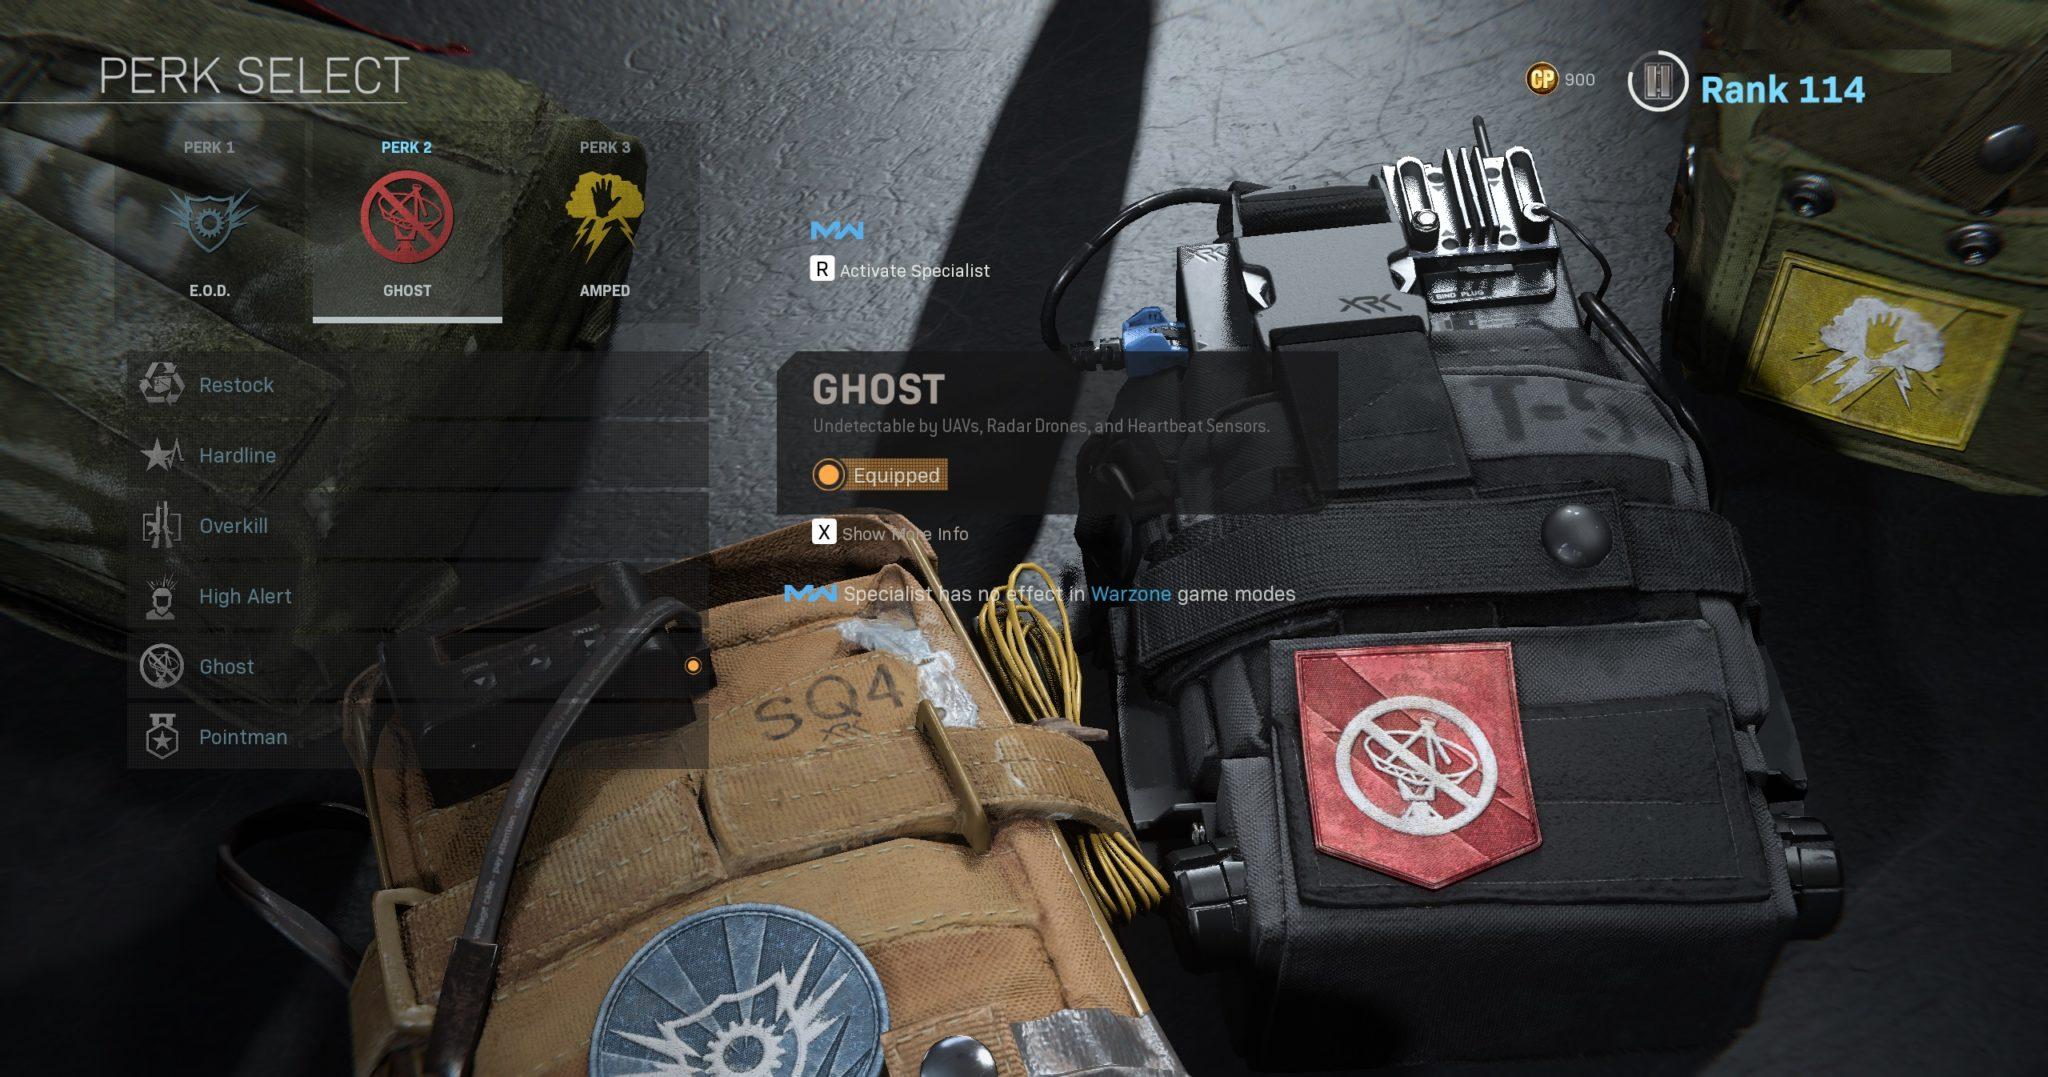 Ghost perk